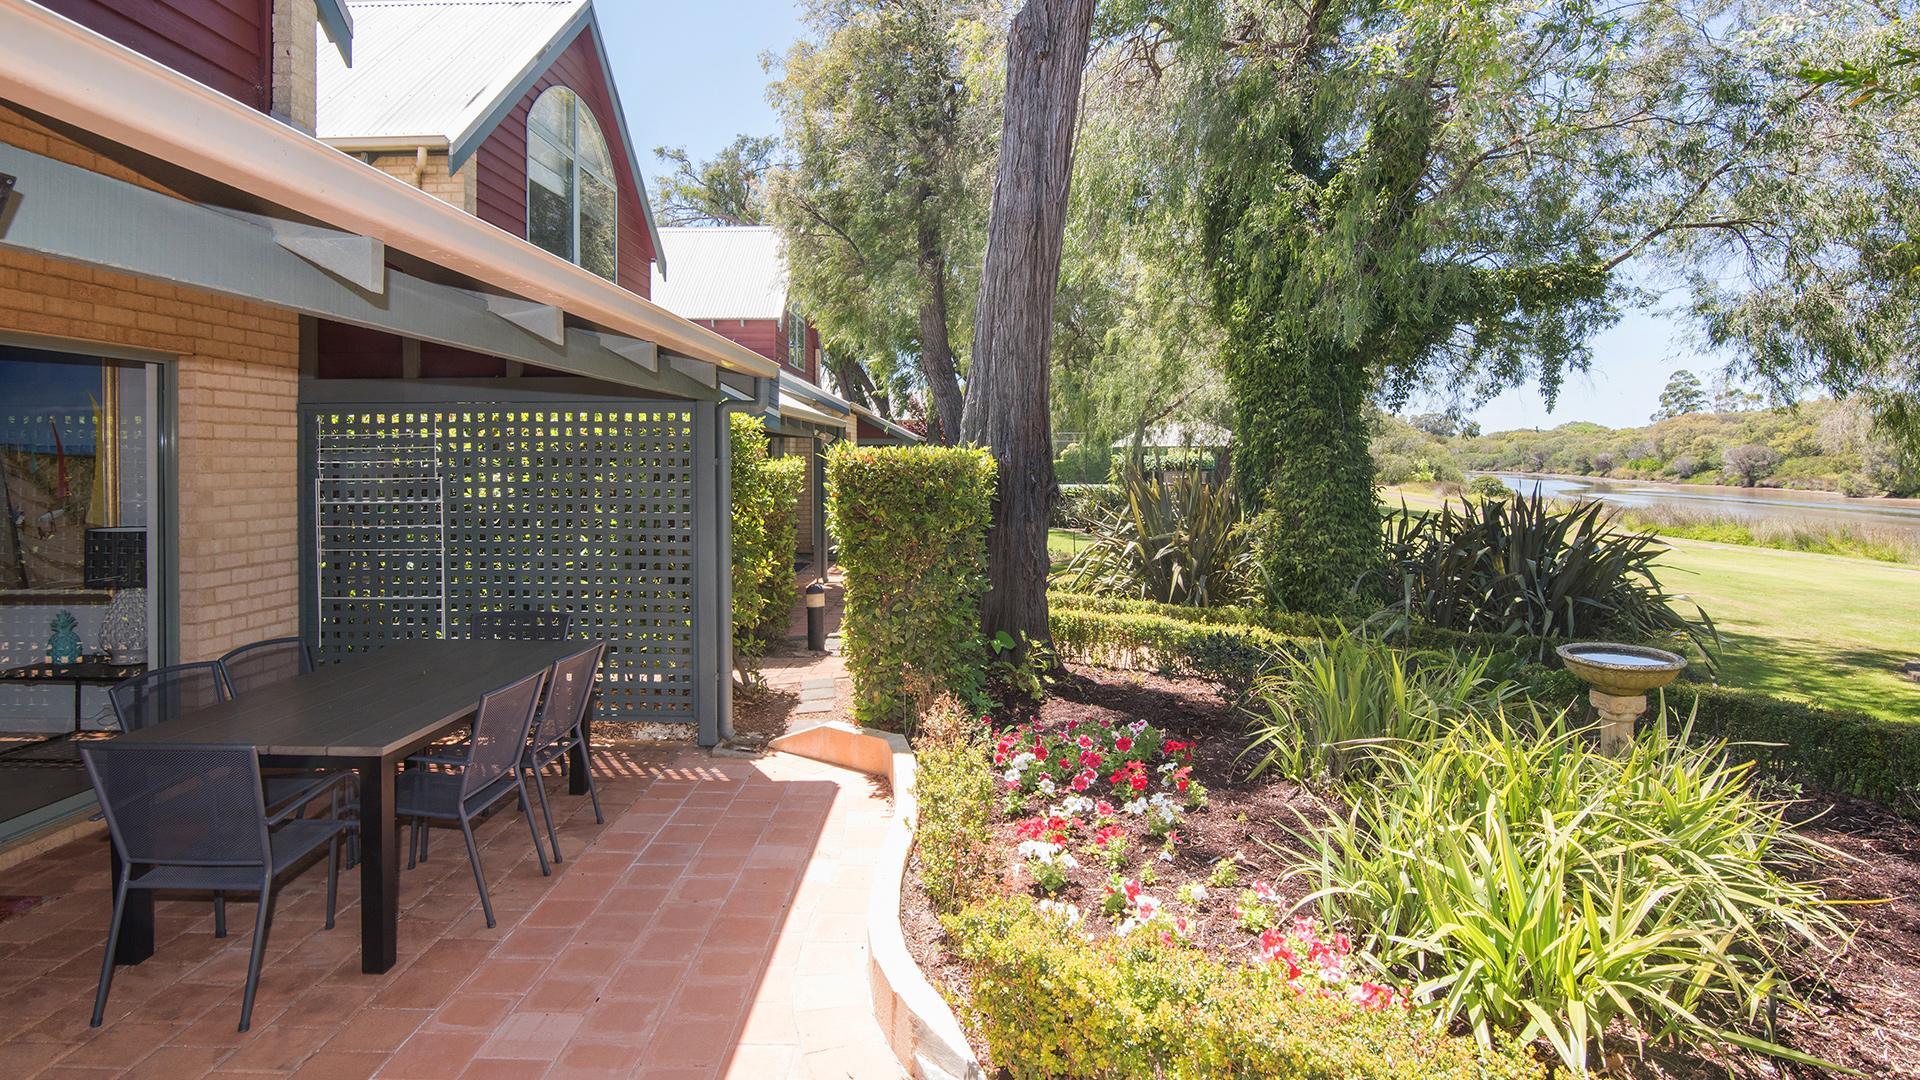 One-Bedroom Villa image 1 at Bayshore Beachside Resort by City of Busselton, Western Australia, Australia